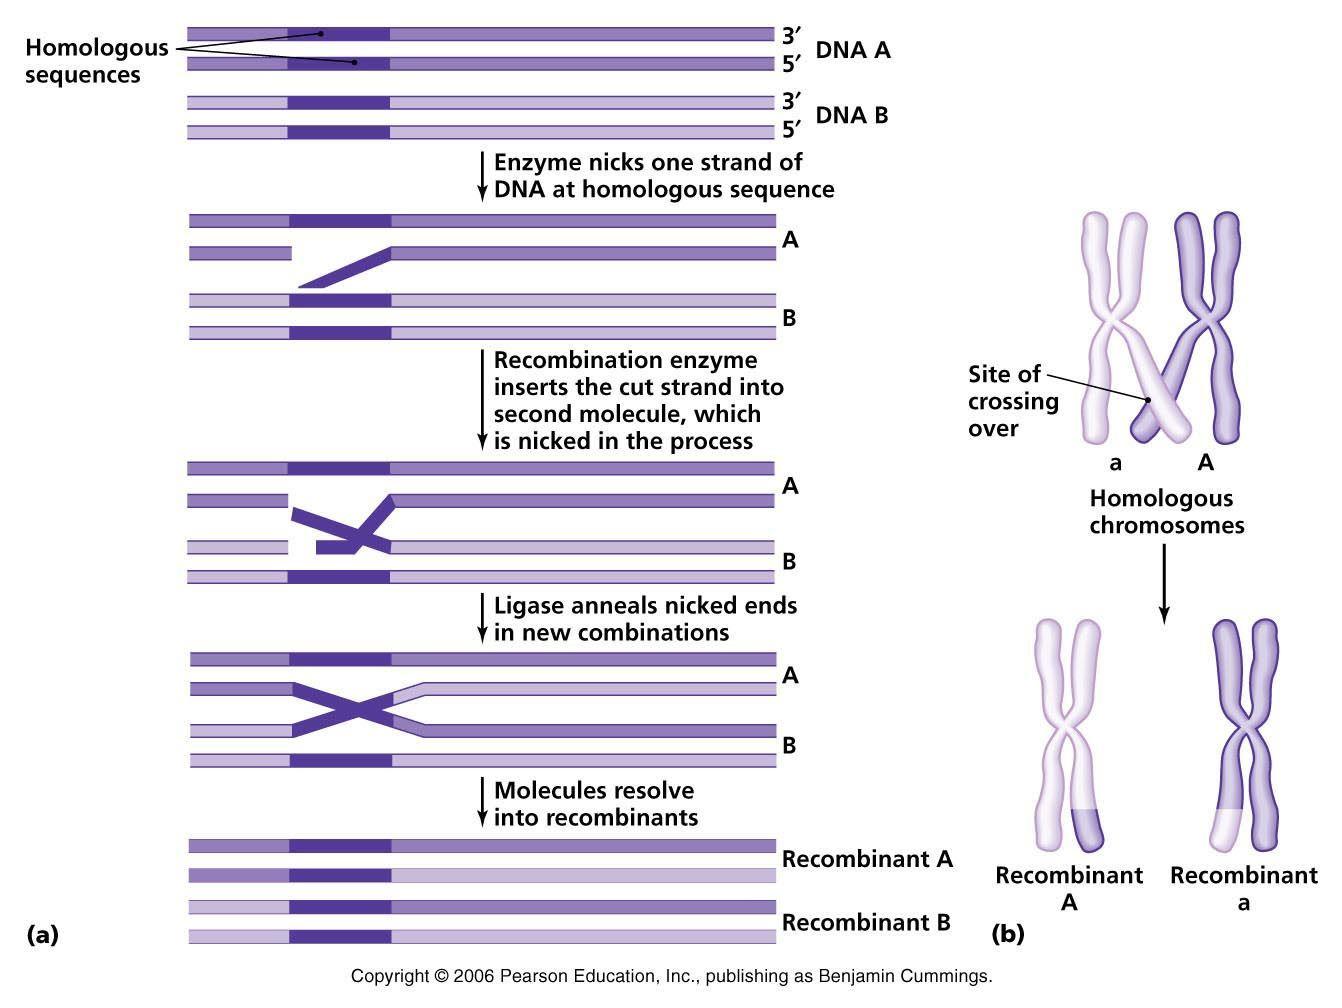 Microbiology, Molecular,